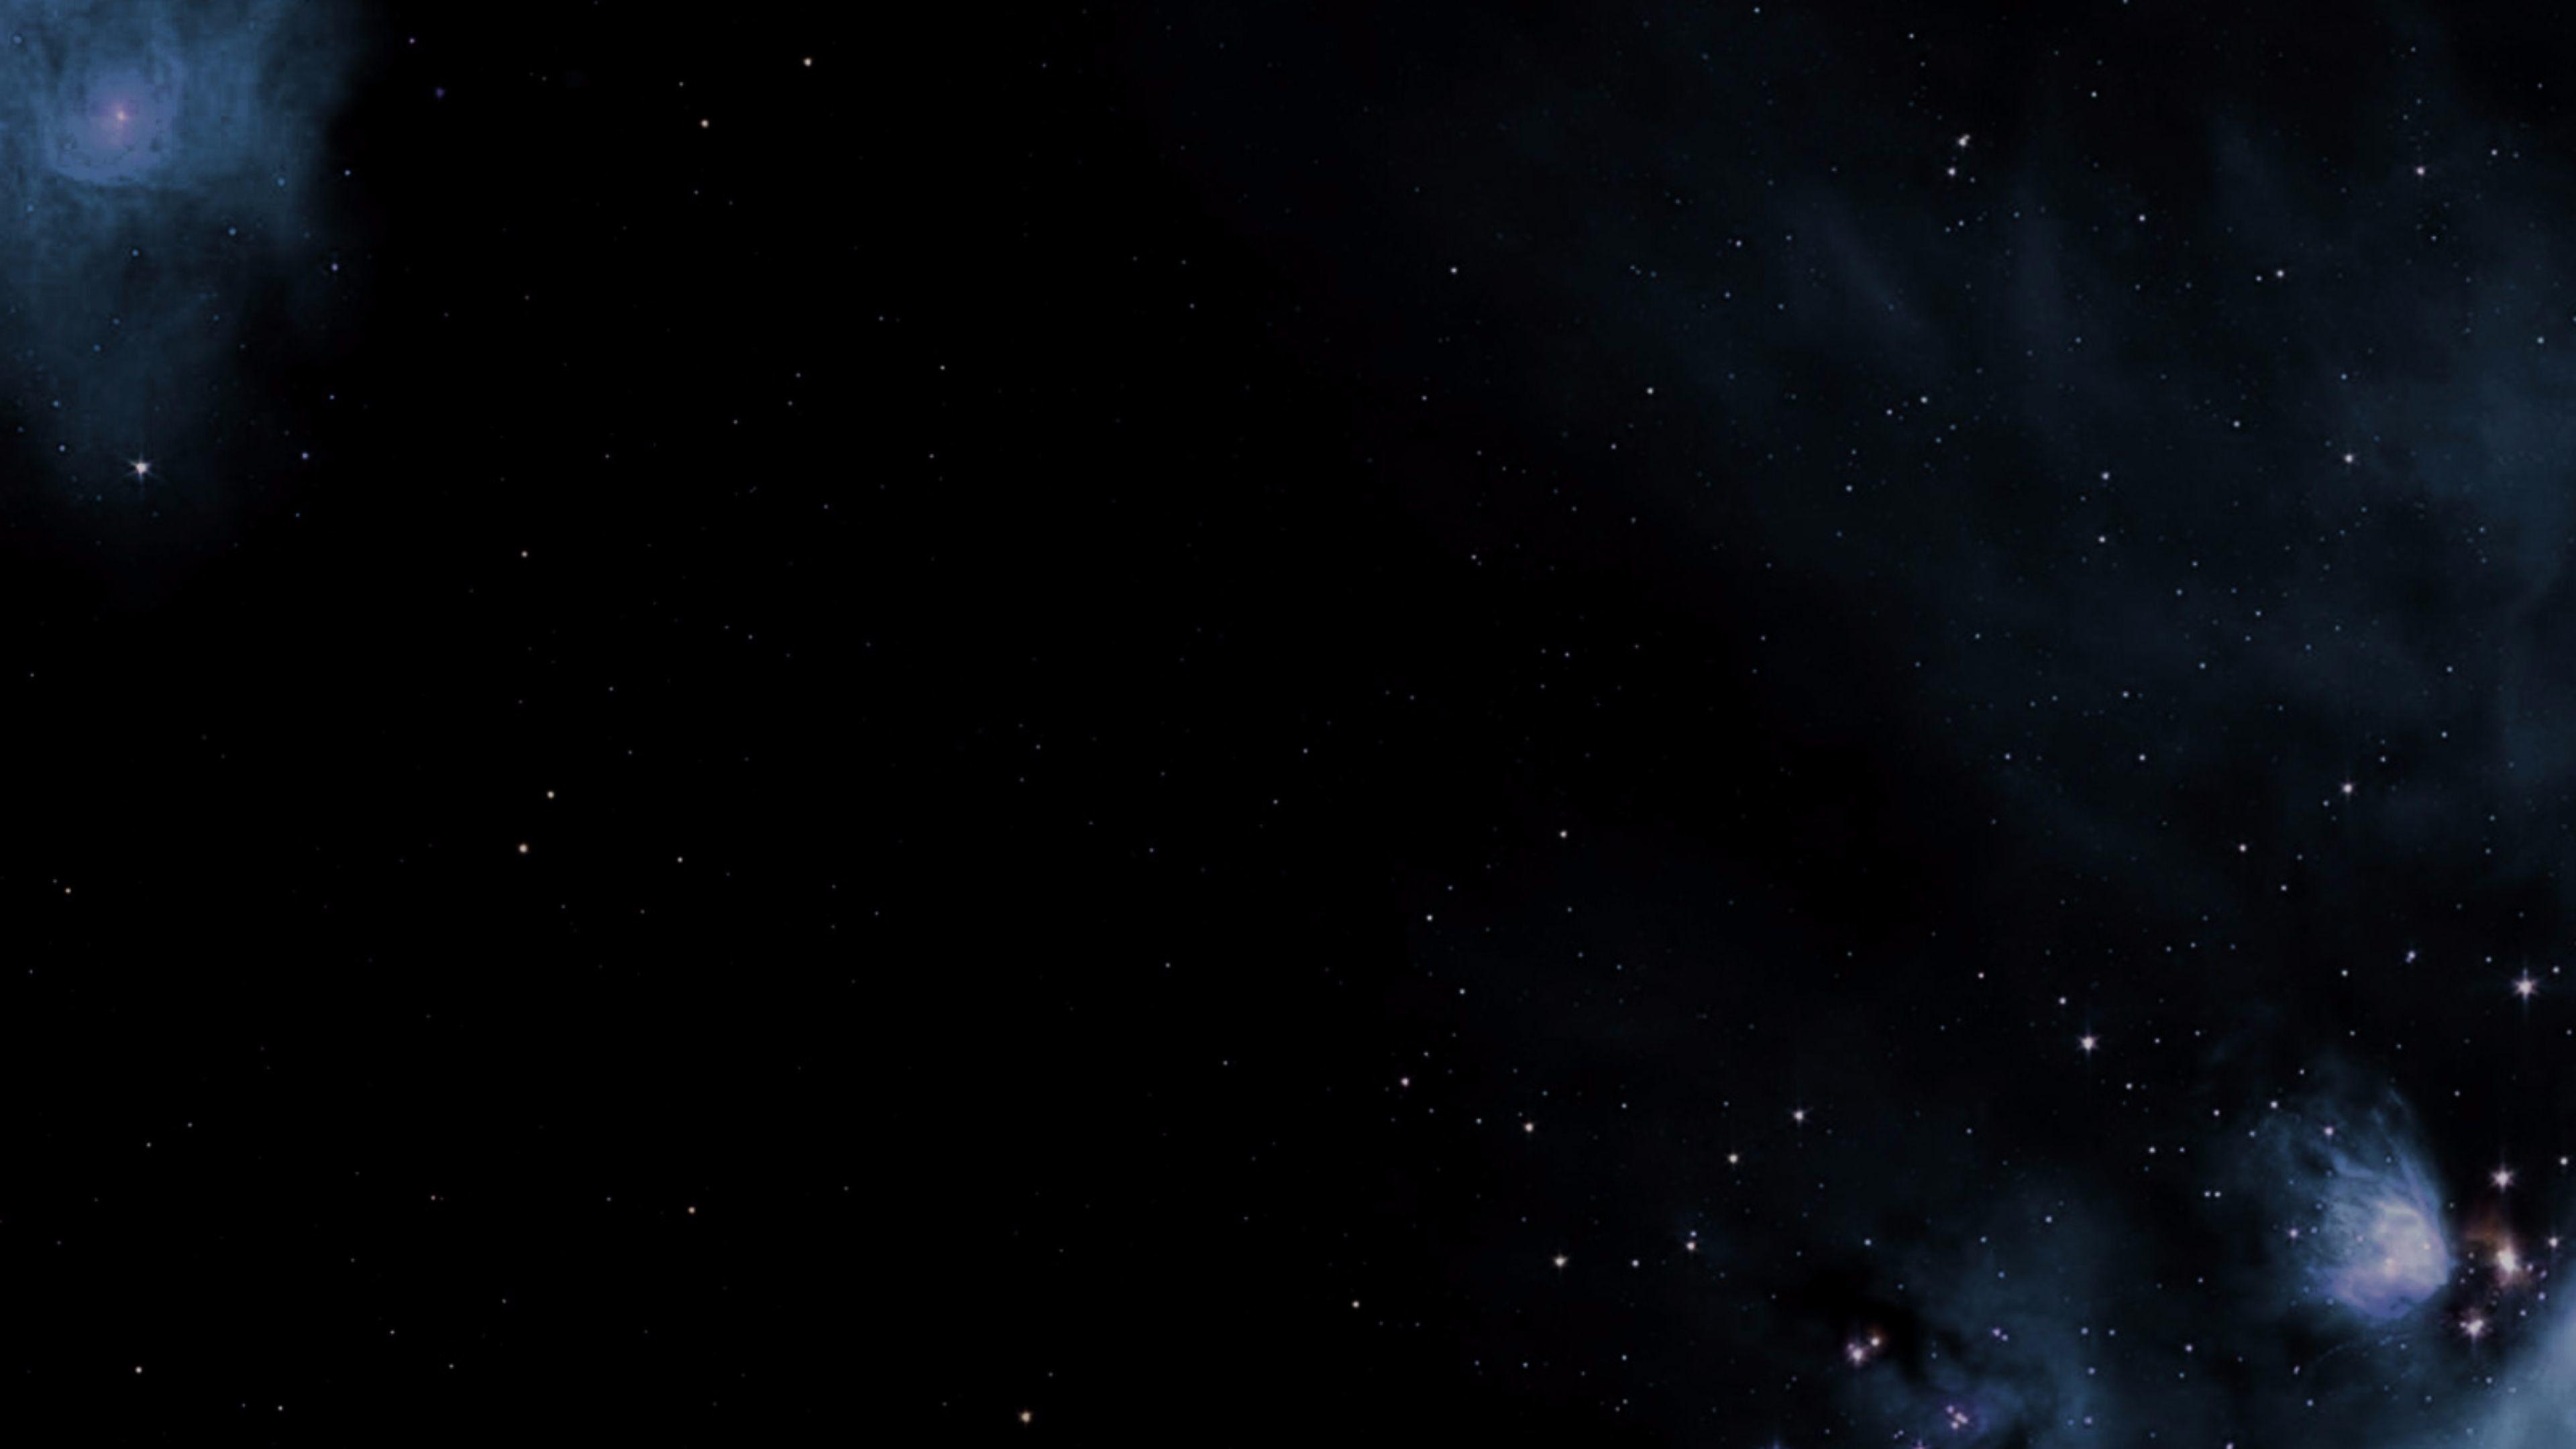 3840x2160 Dark Space Wallpaper Free Download Dark Matter Space